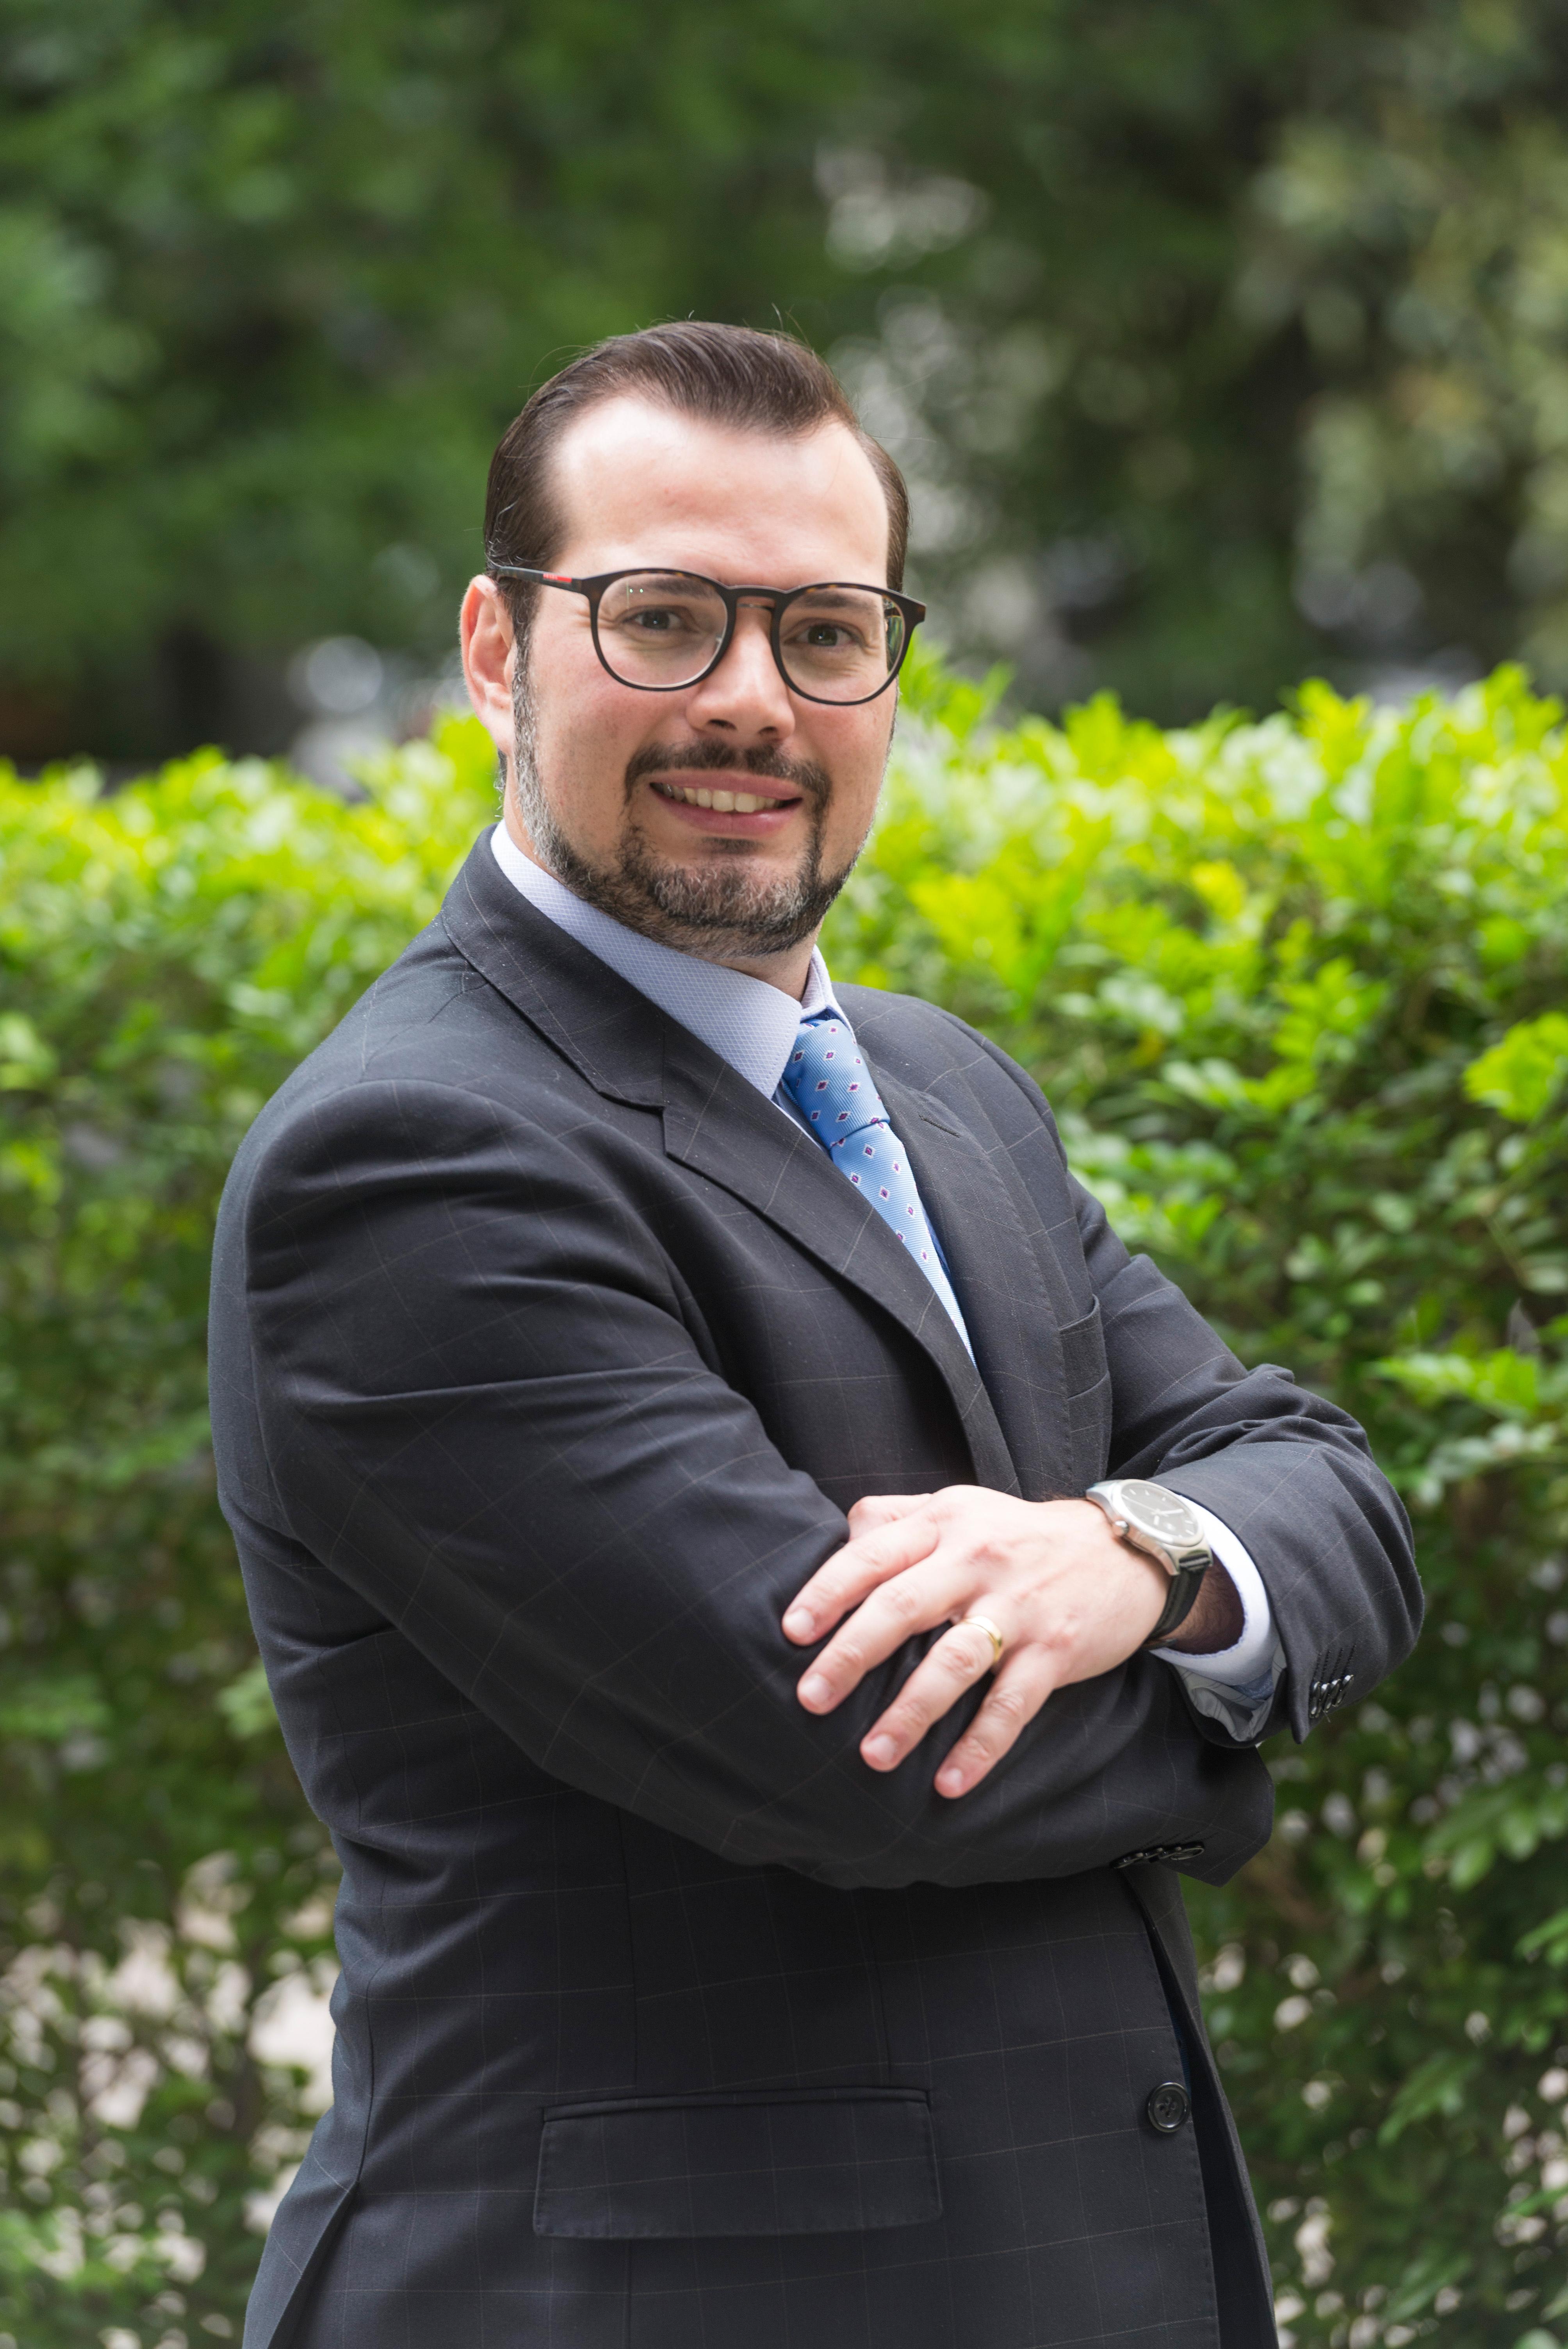 President's Blog | Welcome our New President Carlos RV Silva Filho